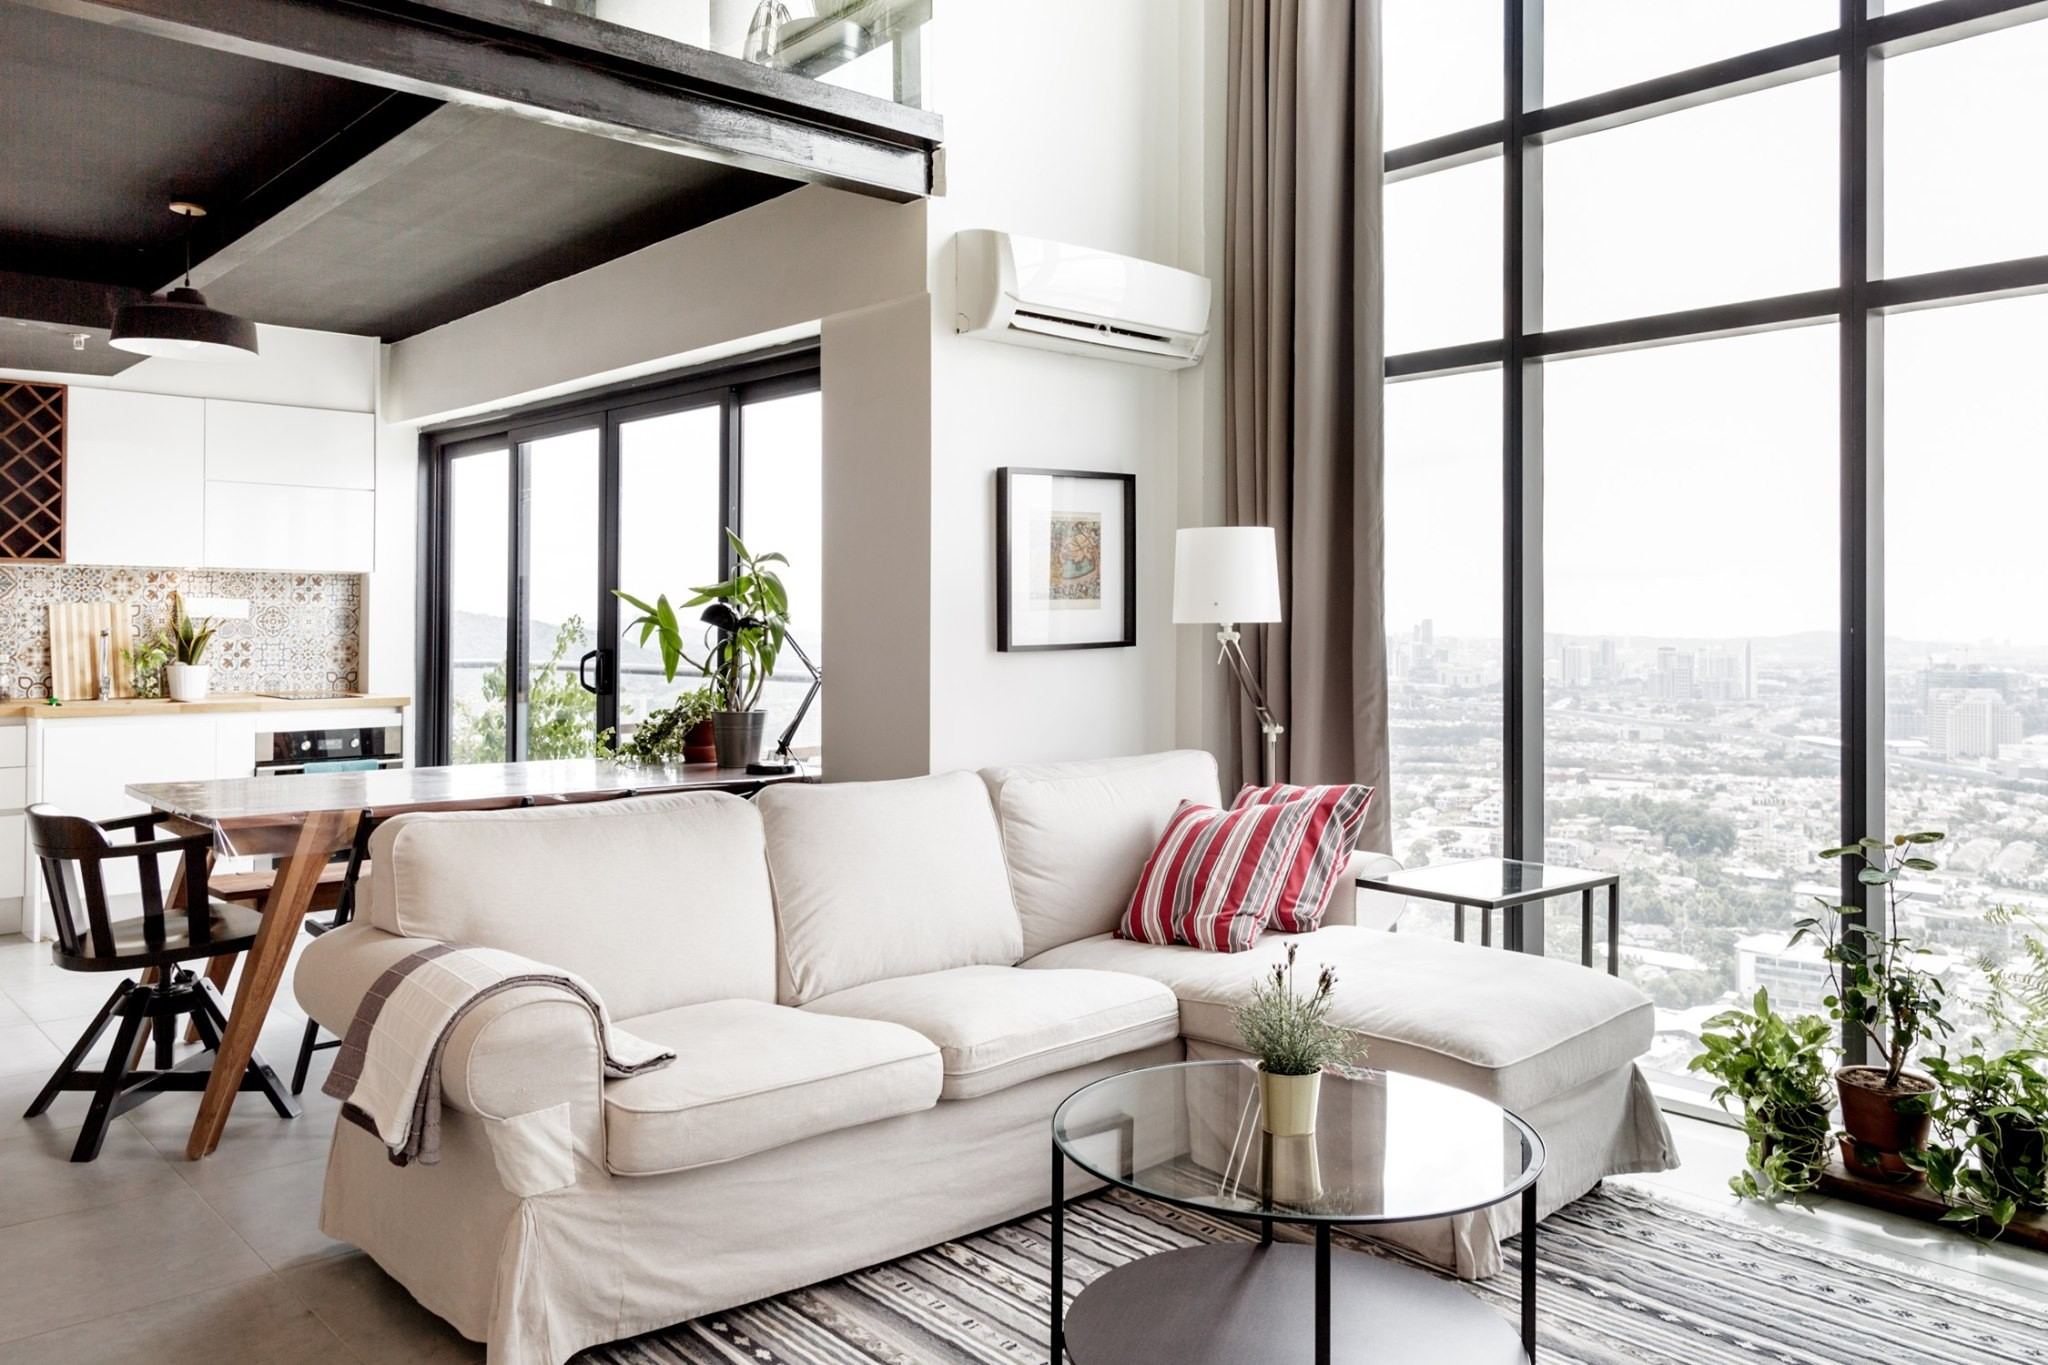 Airbnb Malaysia Petaling Jaya apartment loft with views of twin tower